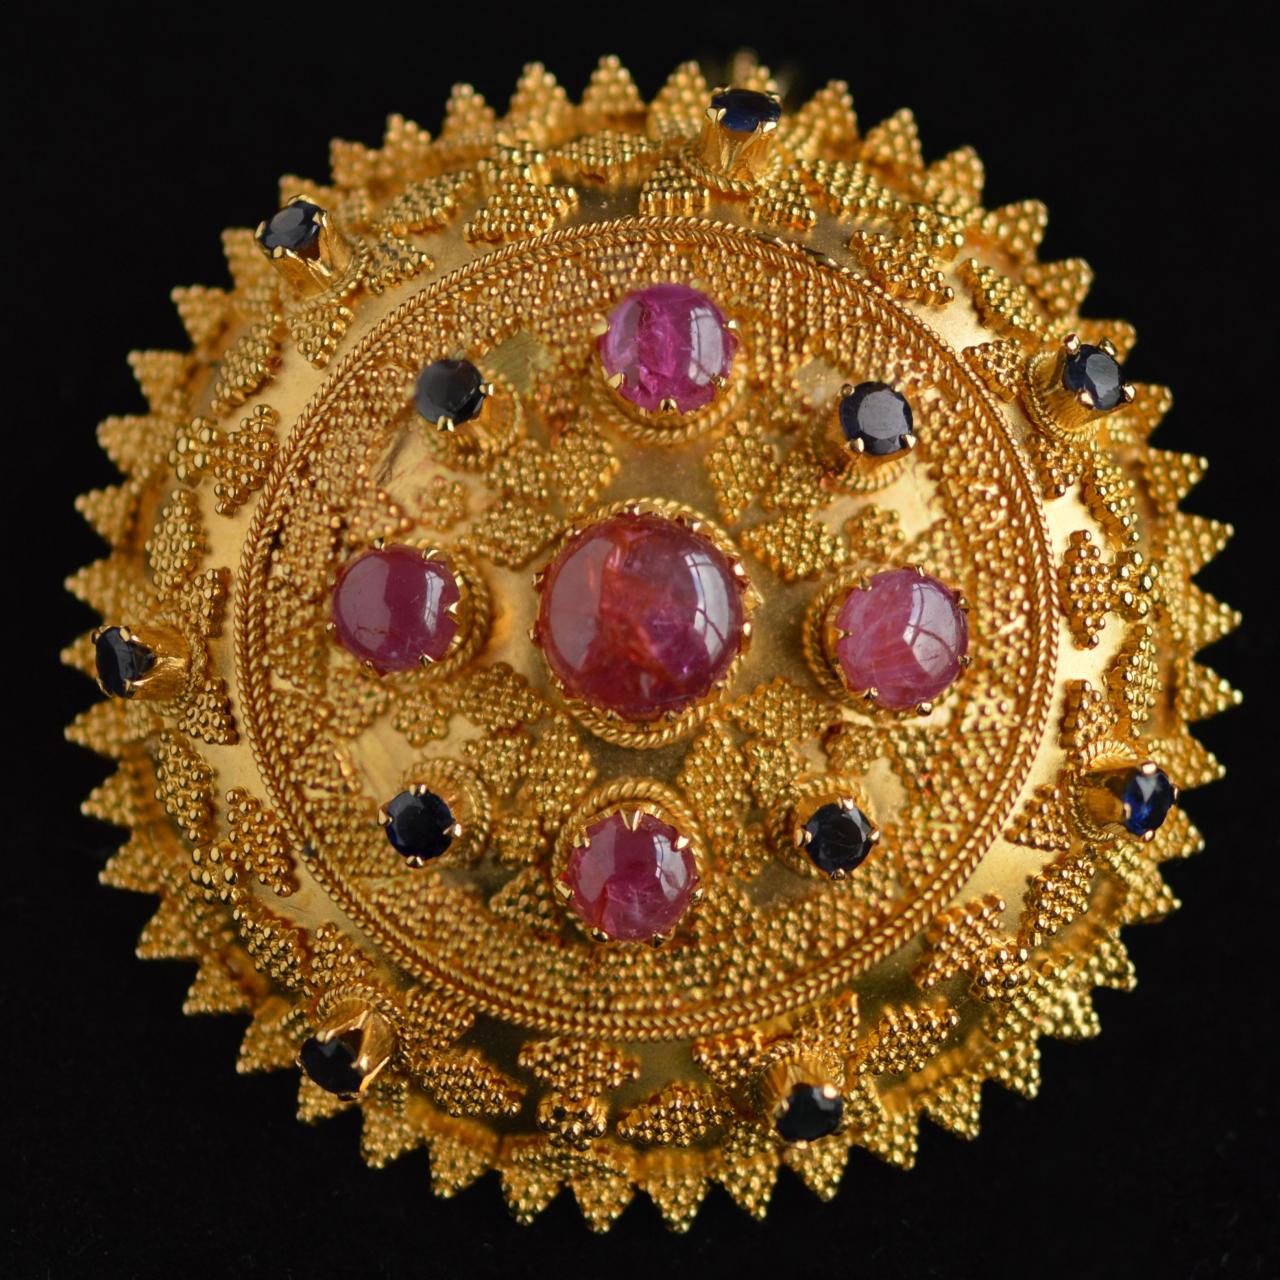 ilias-lalaounis-greek-classical-18k-gold-pendant-brooch